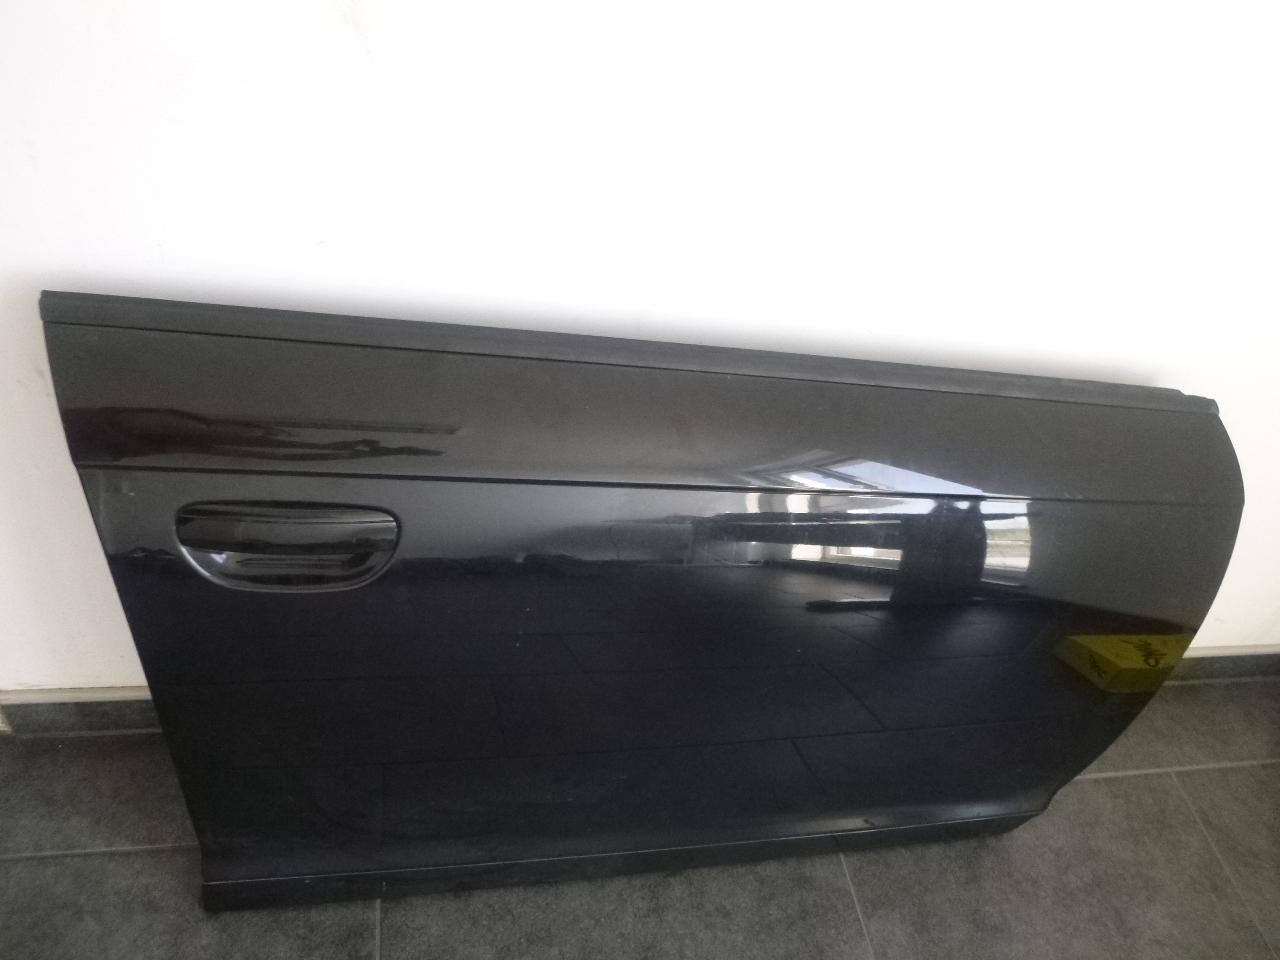 Tür Audi A6 S6 4F 5,2 BXA vorne rechts DE237474